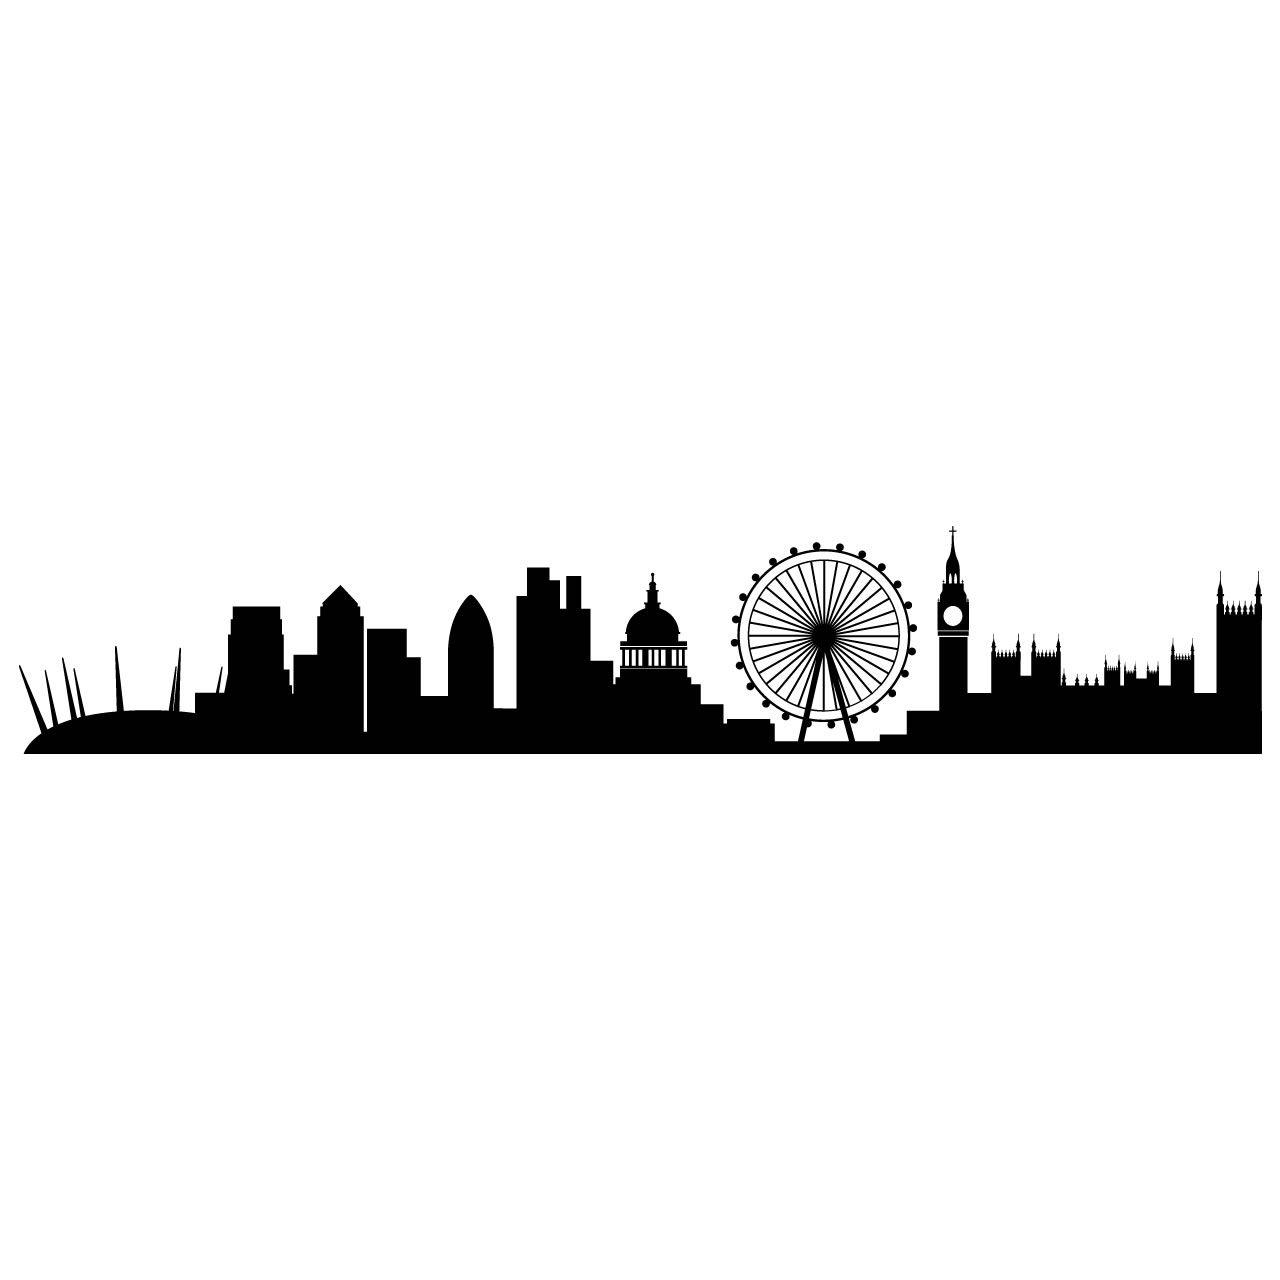 1280x1280 London Skyline Sticker Gus London Skyline